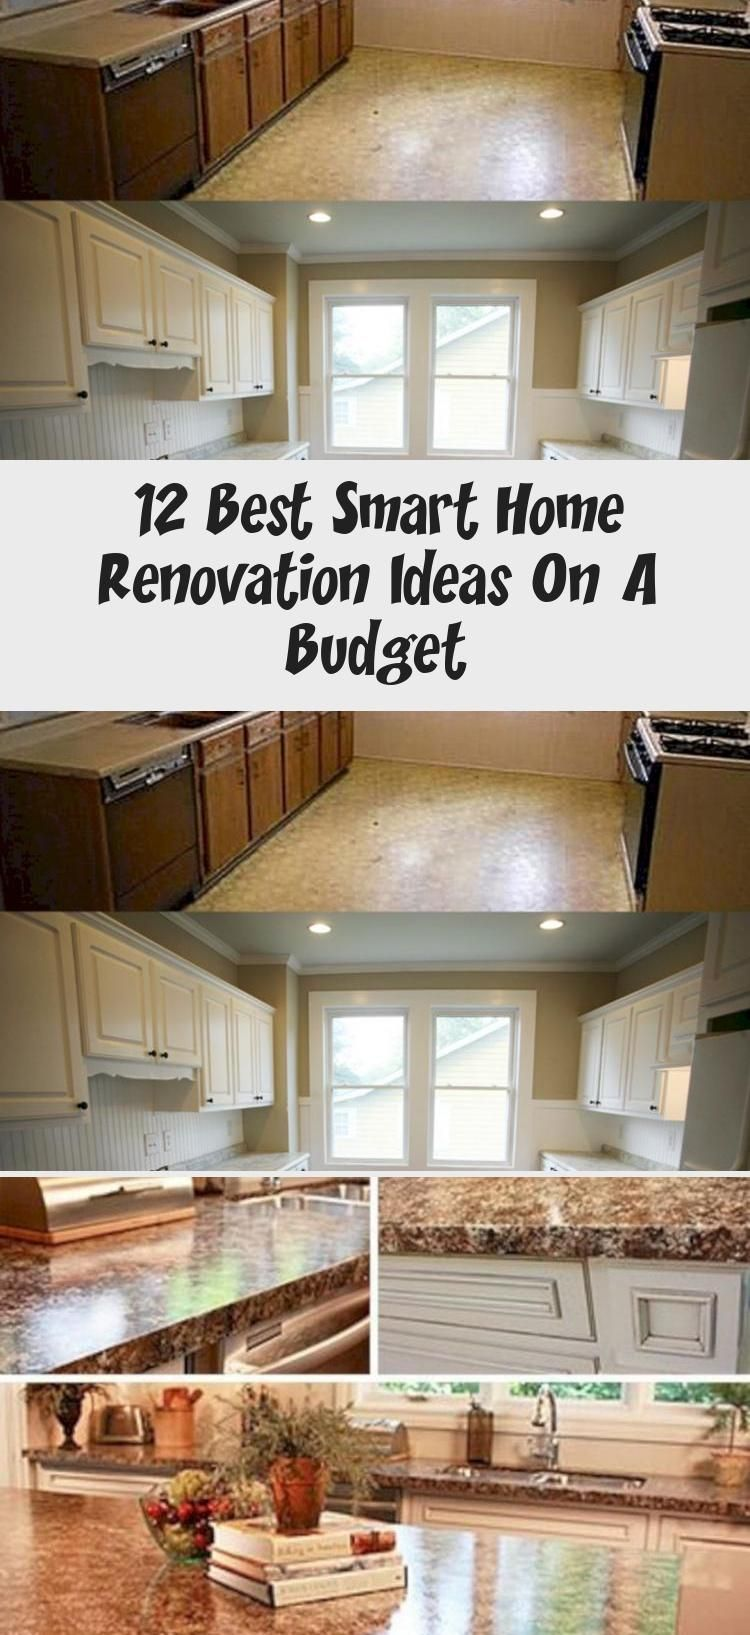 12 Best Smart Home Renovation Ideas On A Budget Best Smart Home